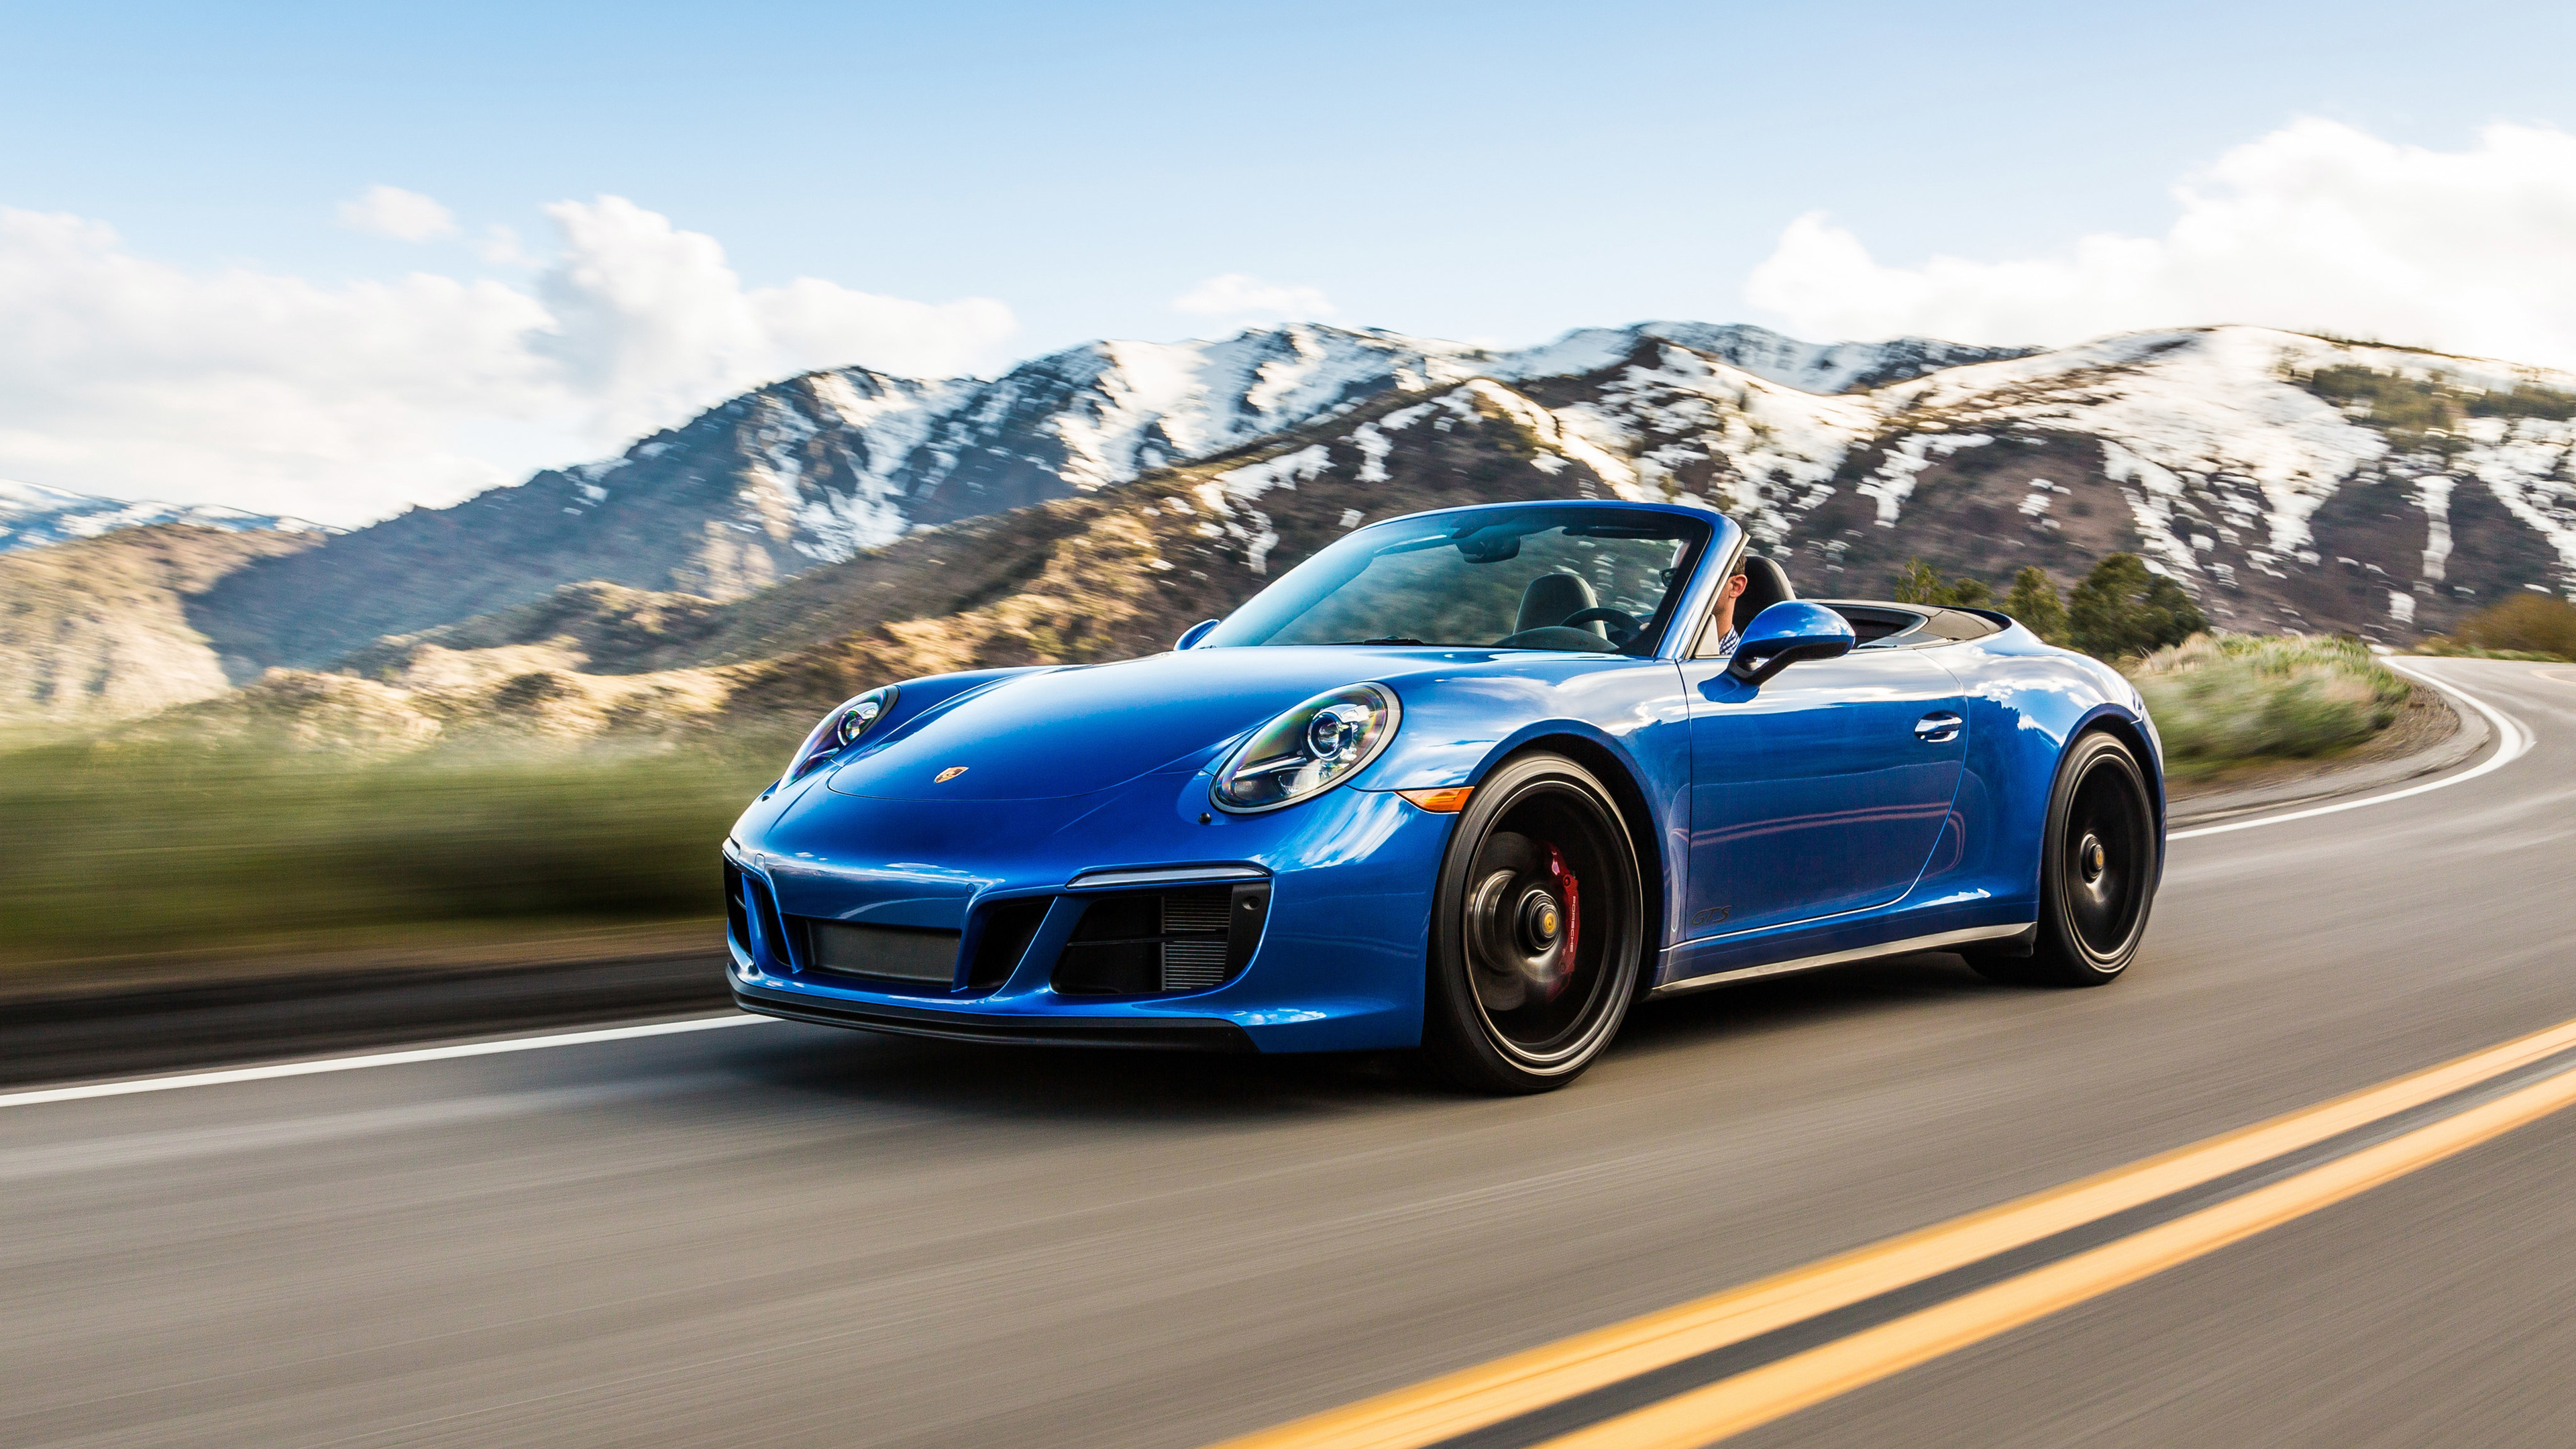 2018 porsche 911 carrera gts cabriolet 1539107639 - 2018 Porsche 911 Carrera GTS Cabriolet - porsche wallpapers, porsche 911 wallpapers, hd-wallpapers, hd wallpapers2018 cars wallpapers, cars wallpapers, 4k-wallpapers